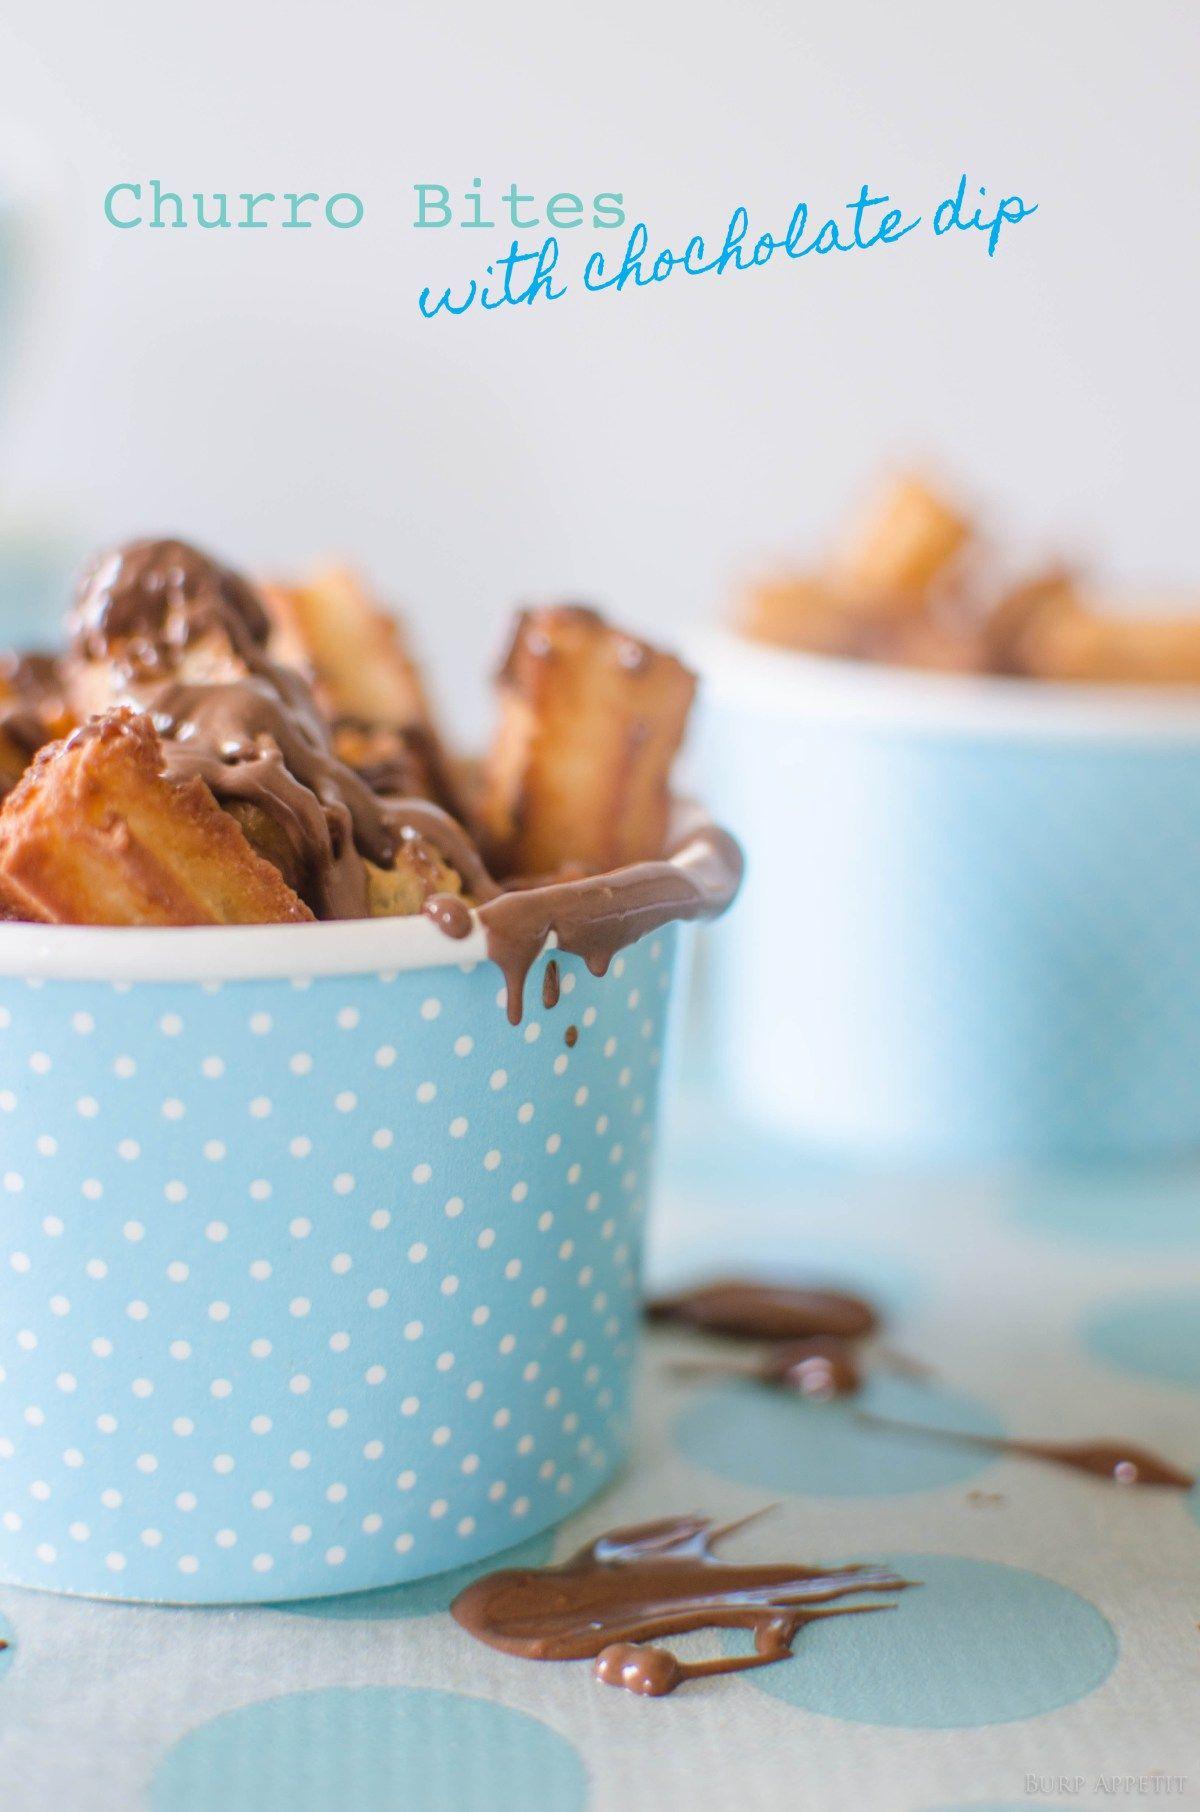 Churro Bites with Chocolate Dip | Churro, Dips and Chocolate